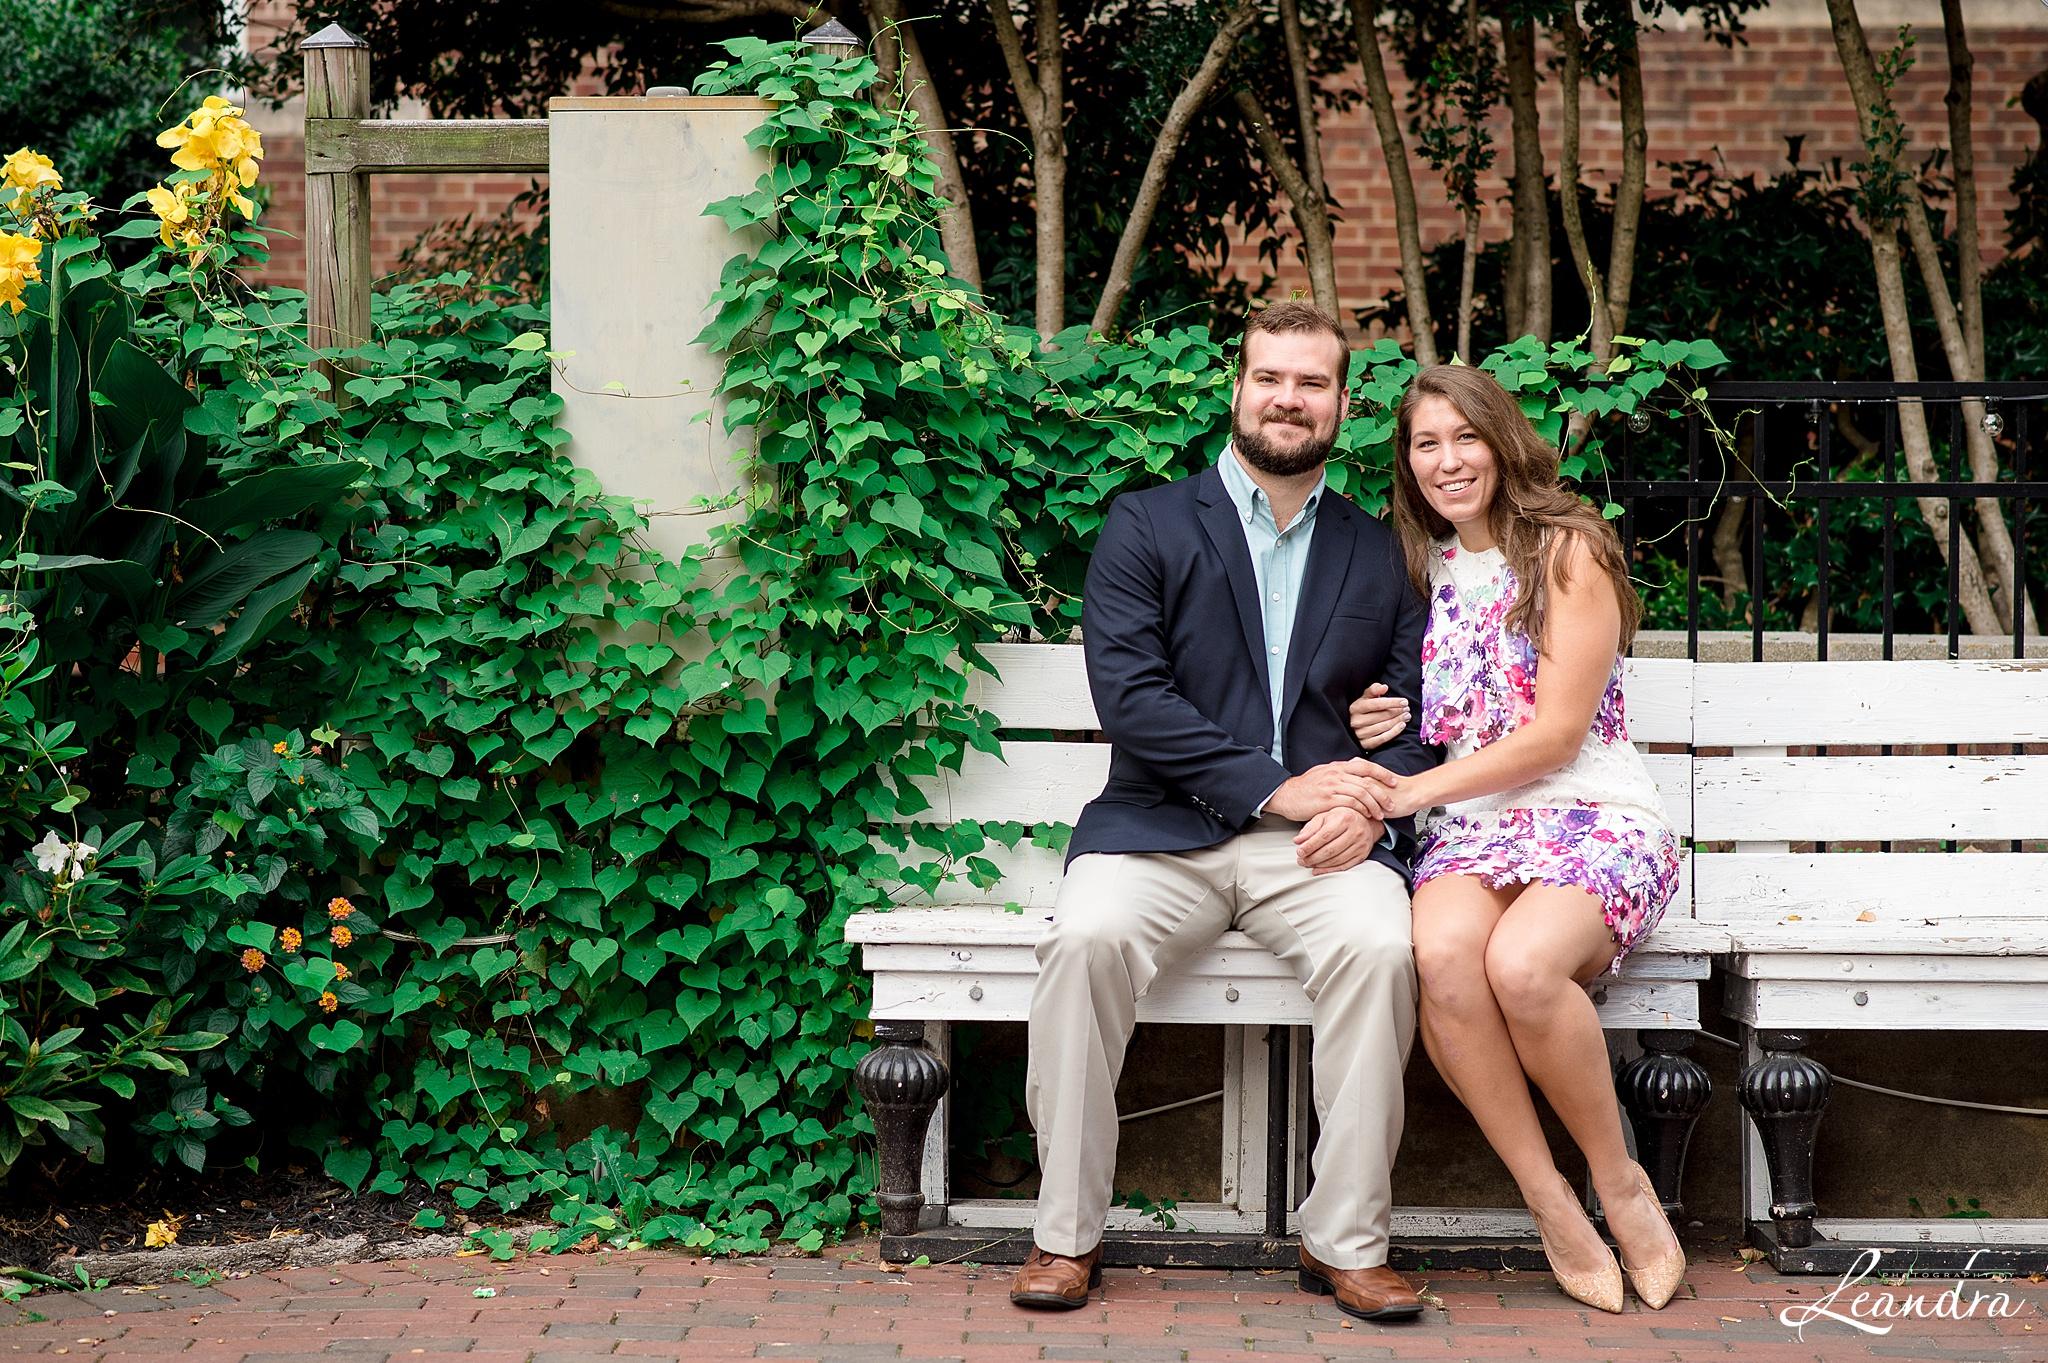 EmilyandJeff.Engaged-11.jpg